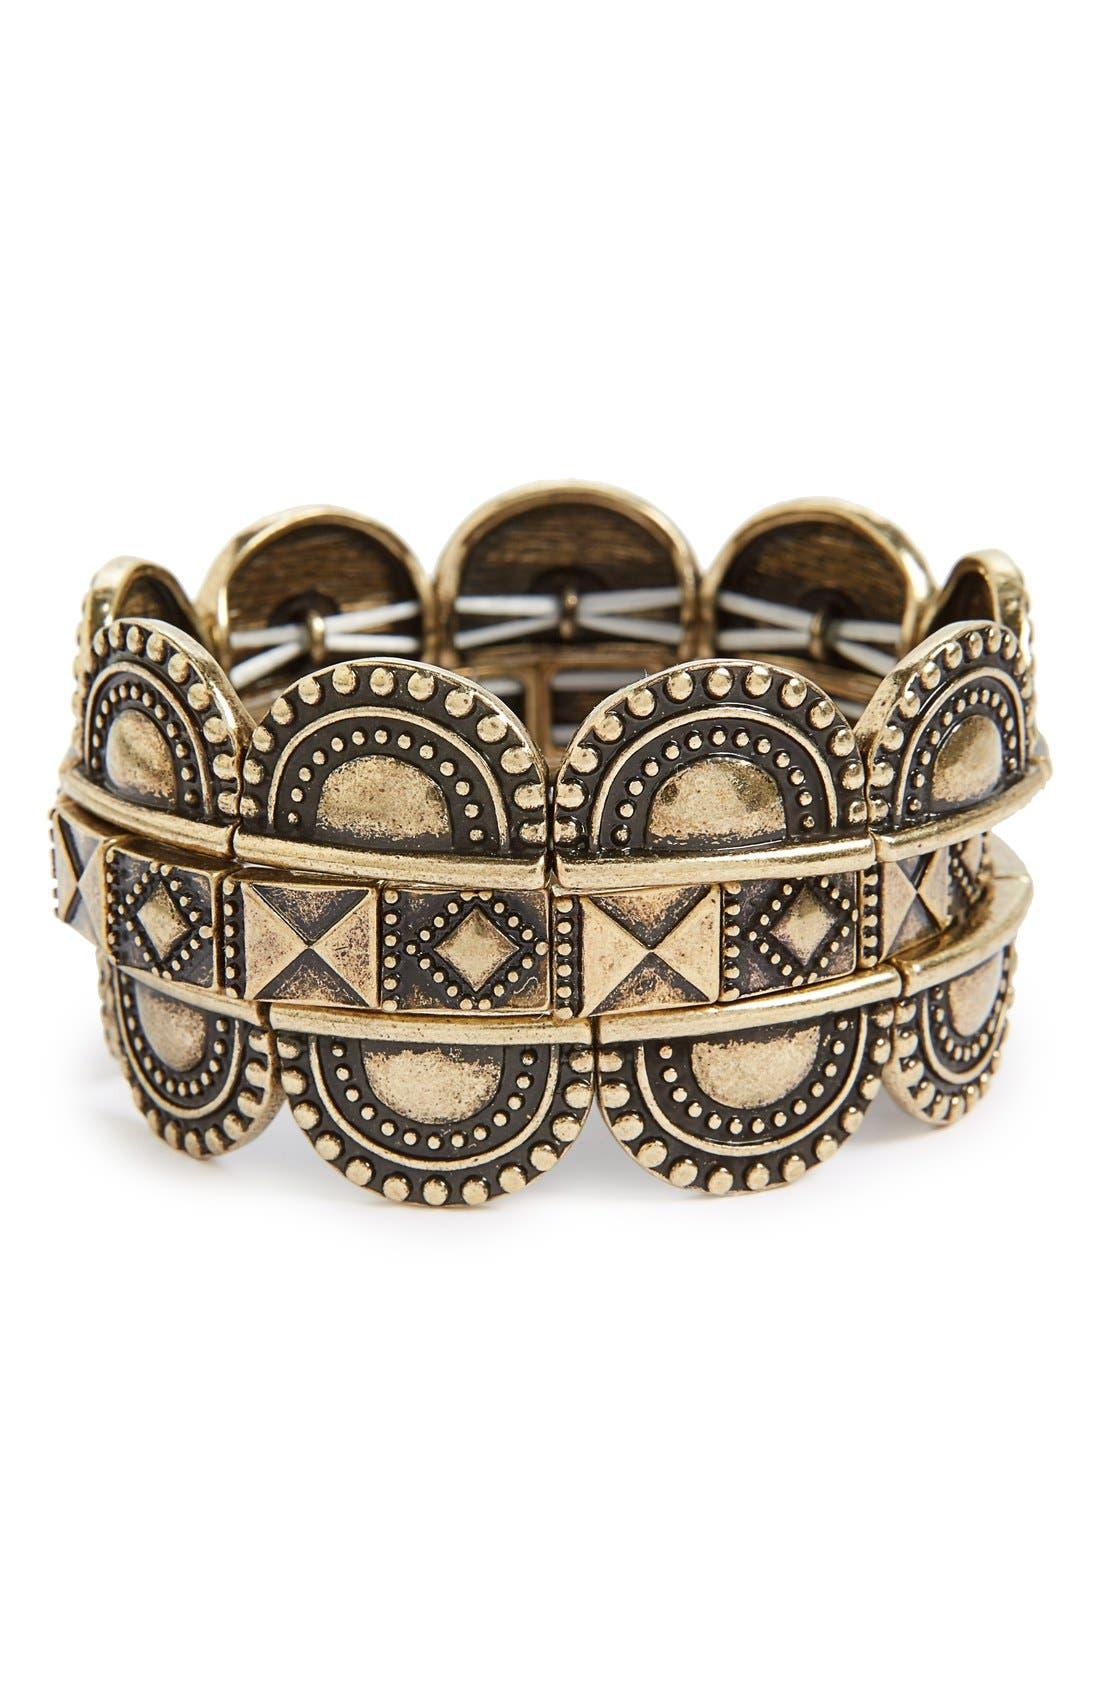 Alternate Image 1 Selected - BP. Bangle Bracelets (Set of 3)